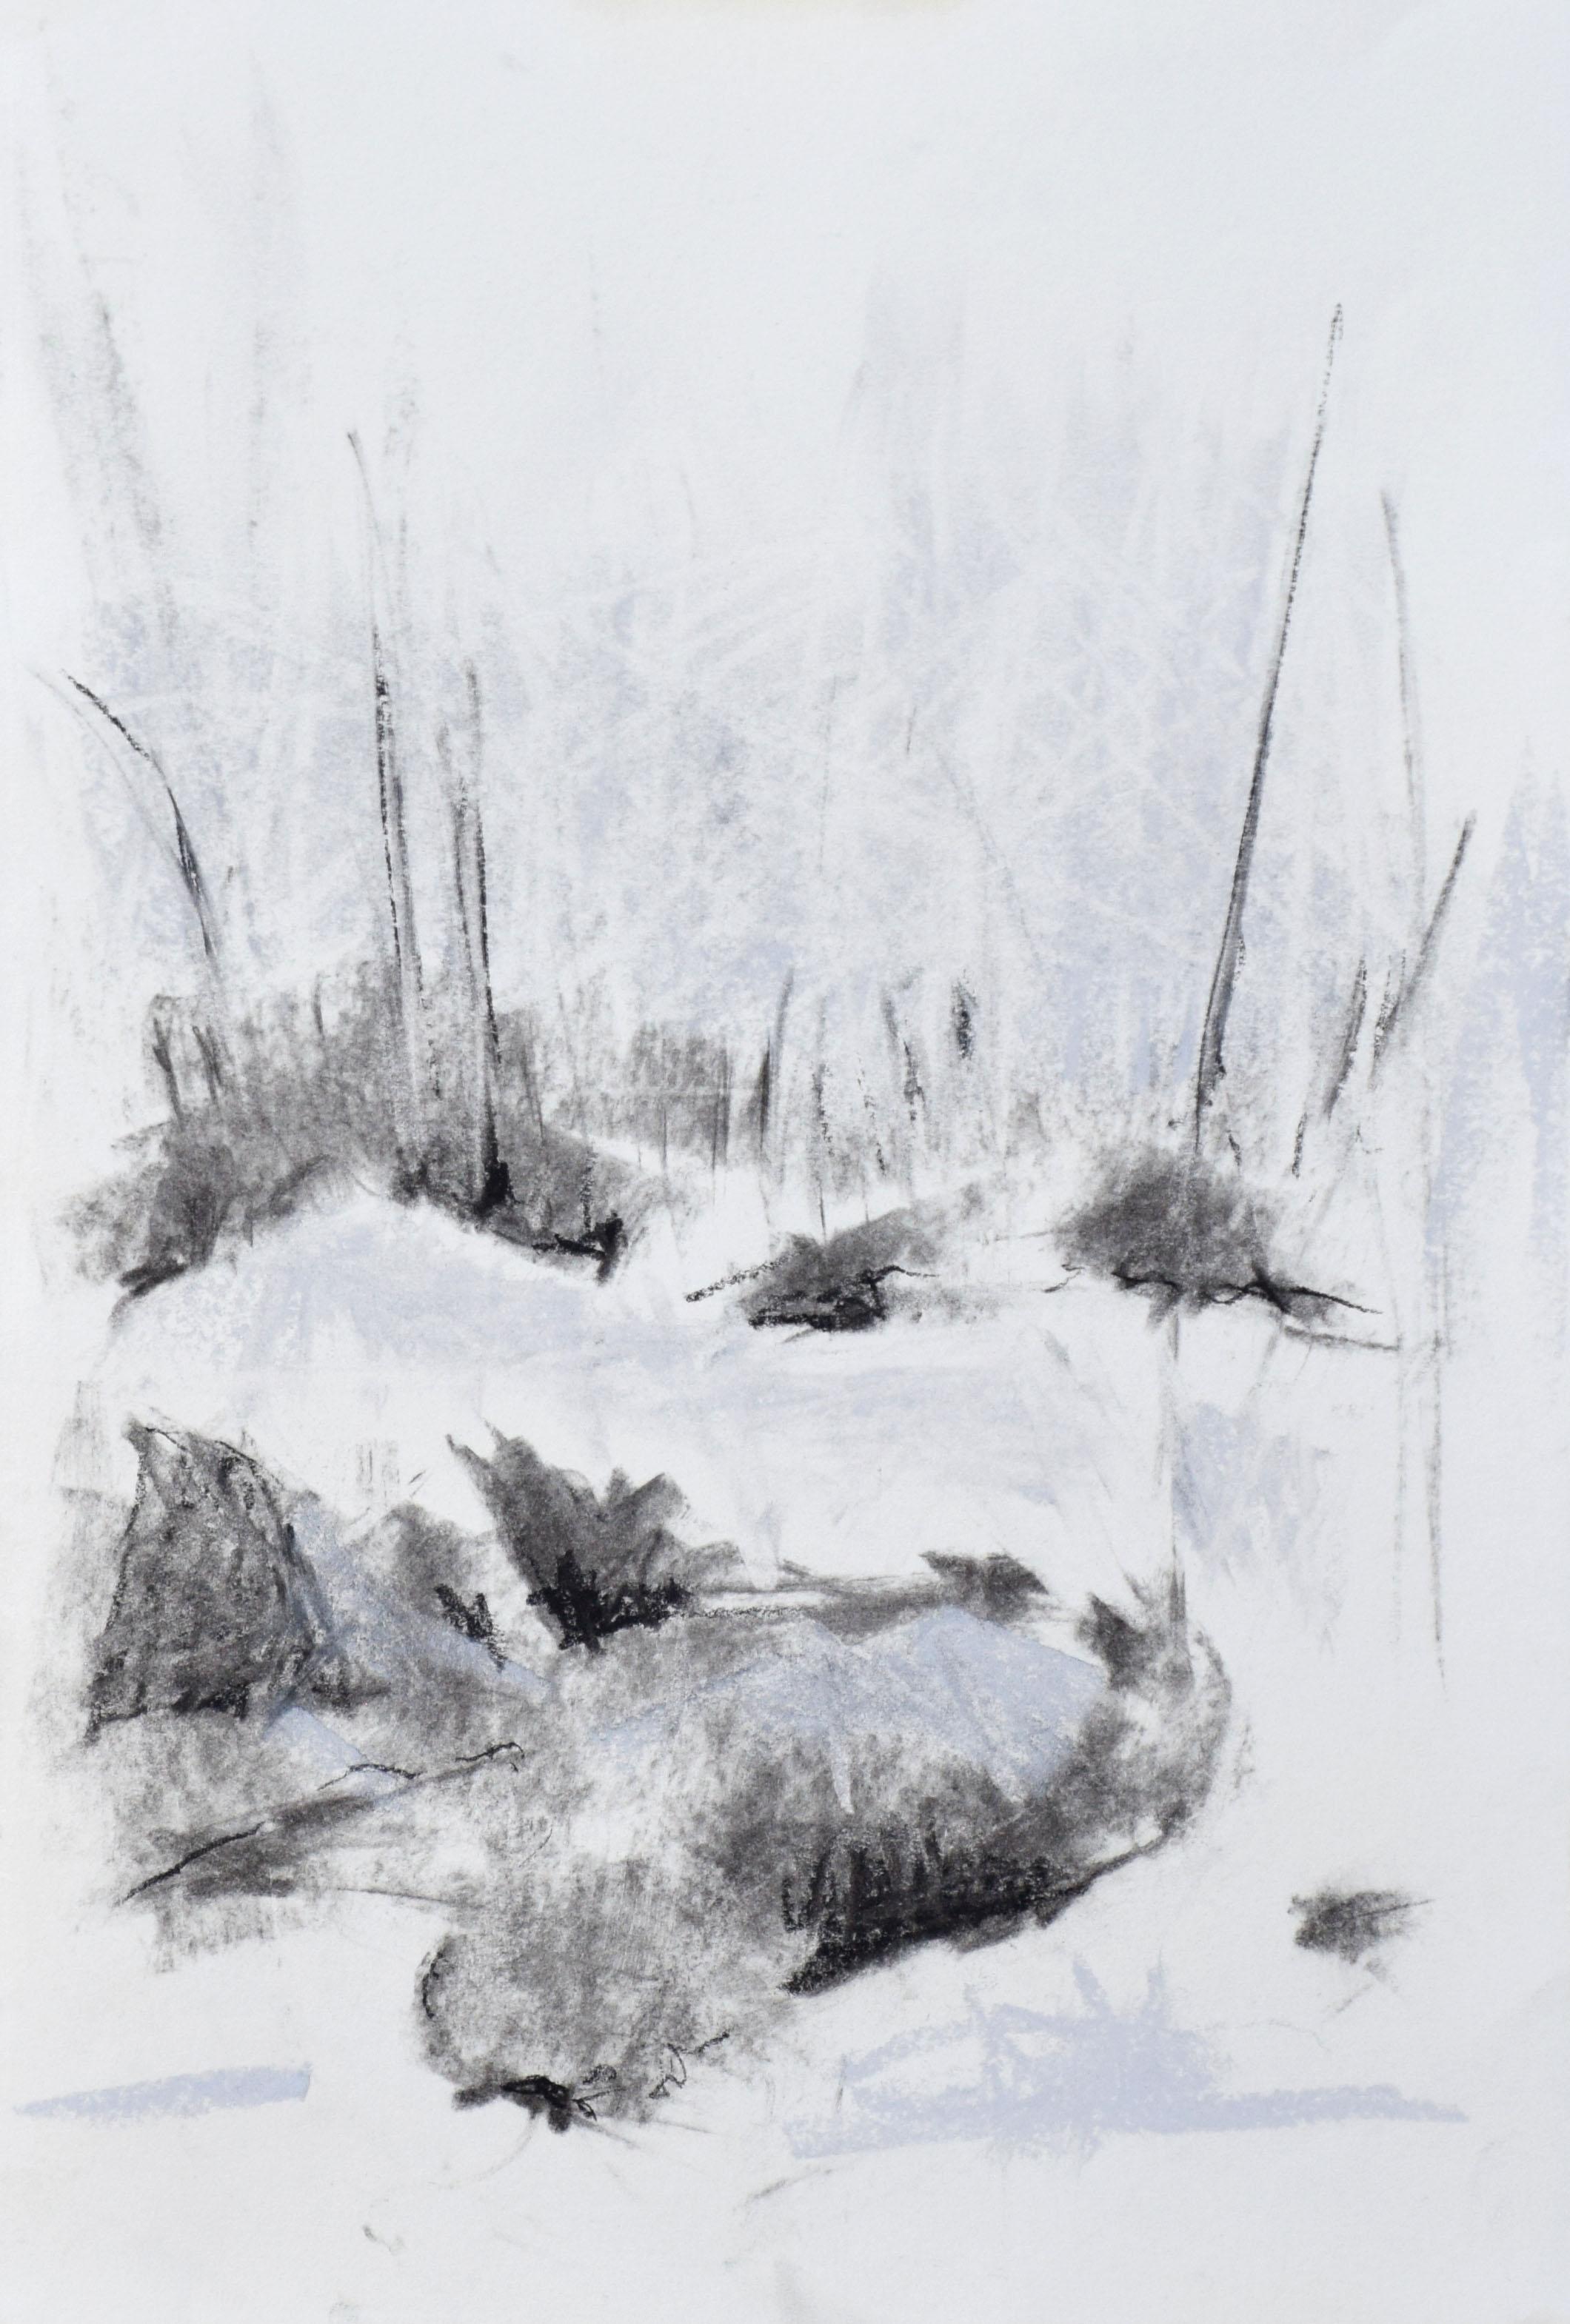 "#6 Yosemite II   Charcoal on Paper  11"" x 15""  SOLD"